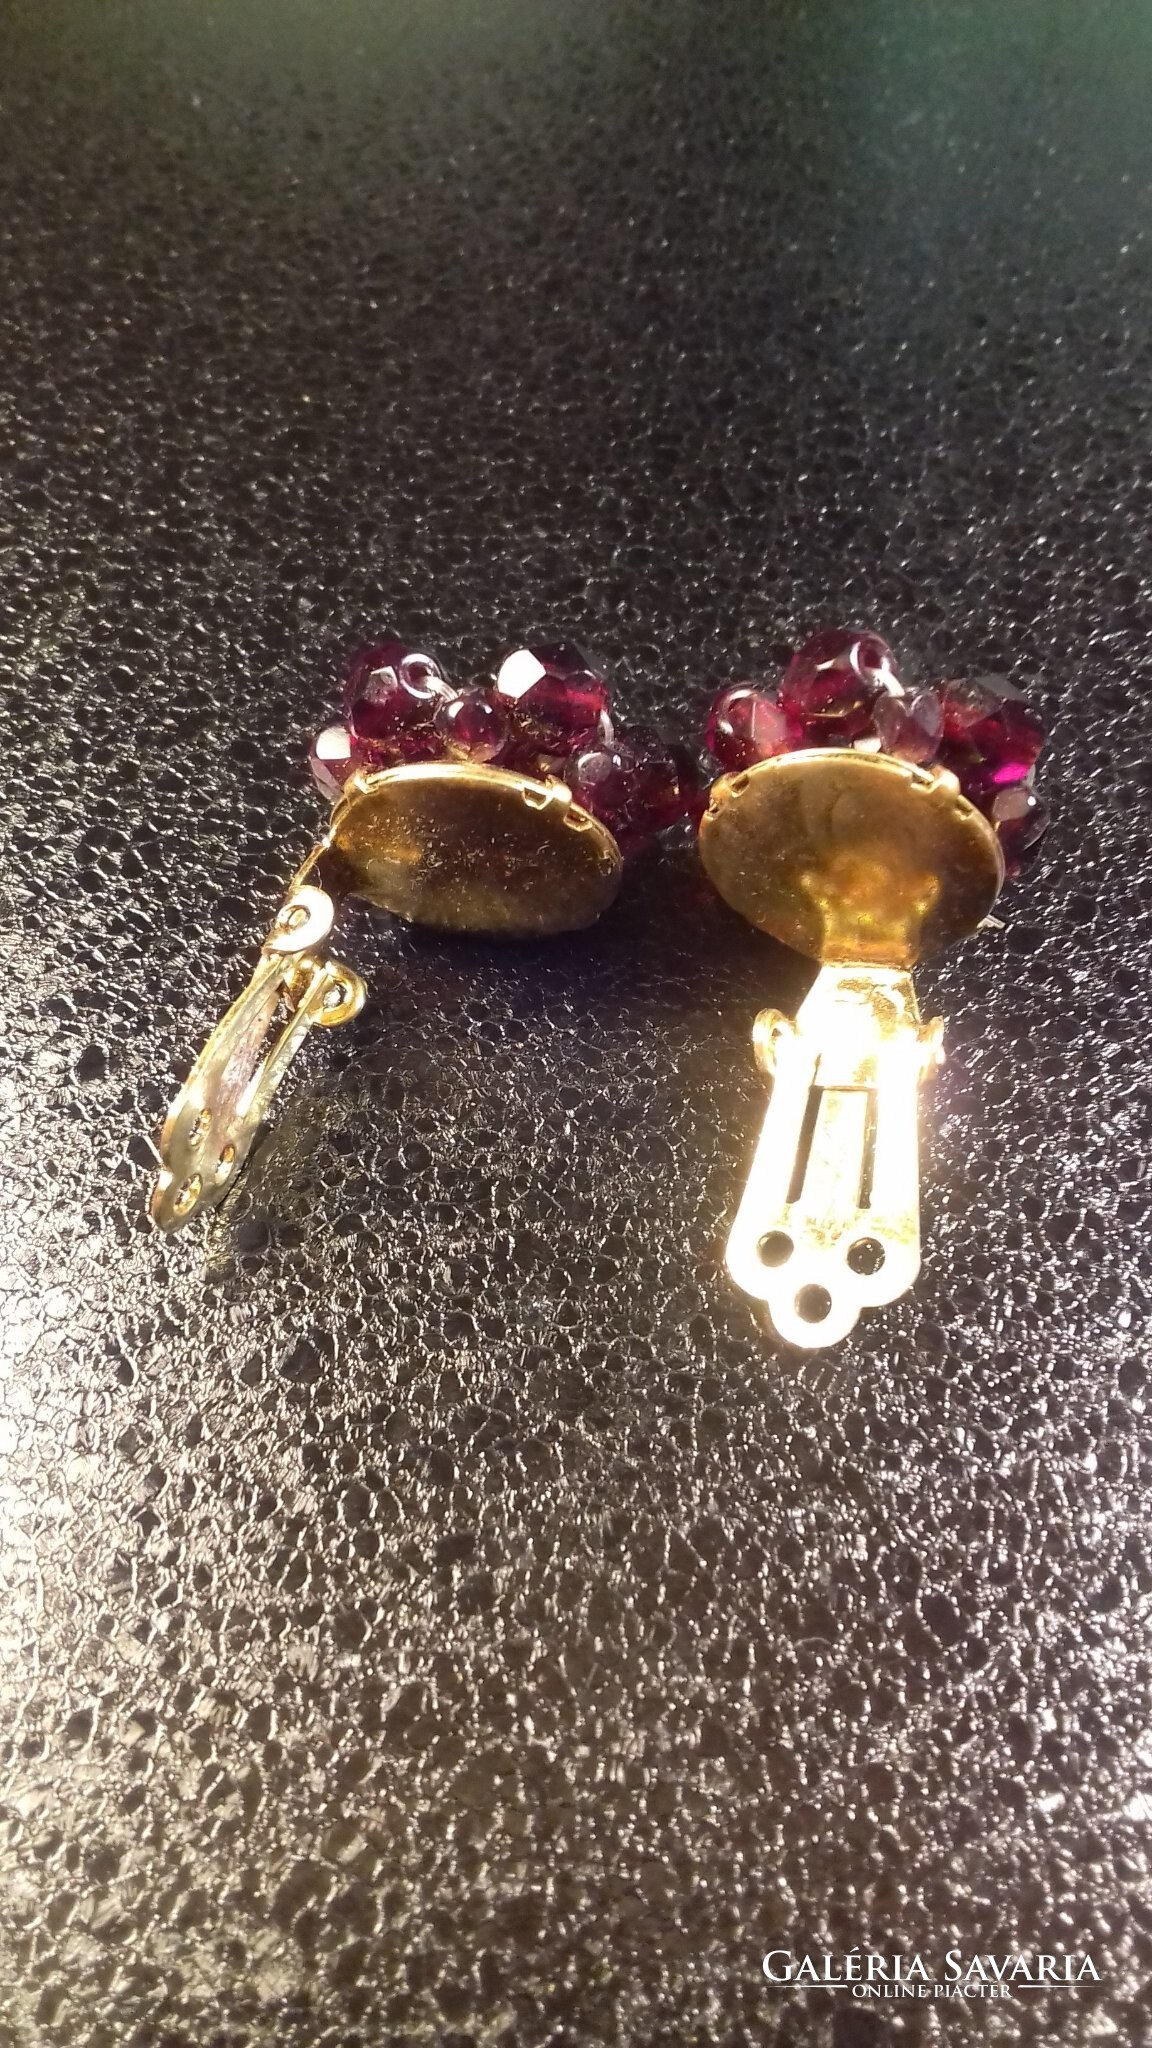 Piros, virág alakú fülklipsz 120 Jewelry | Galeria Savaria